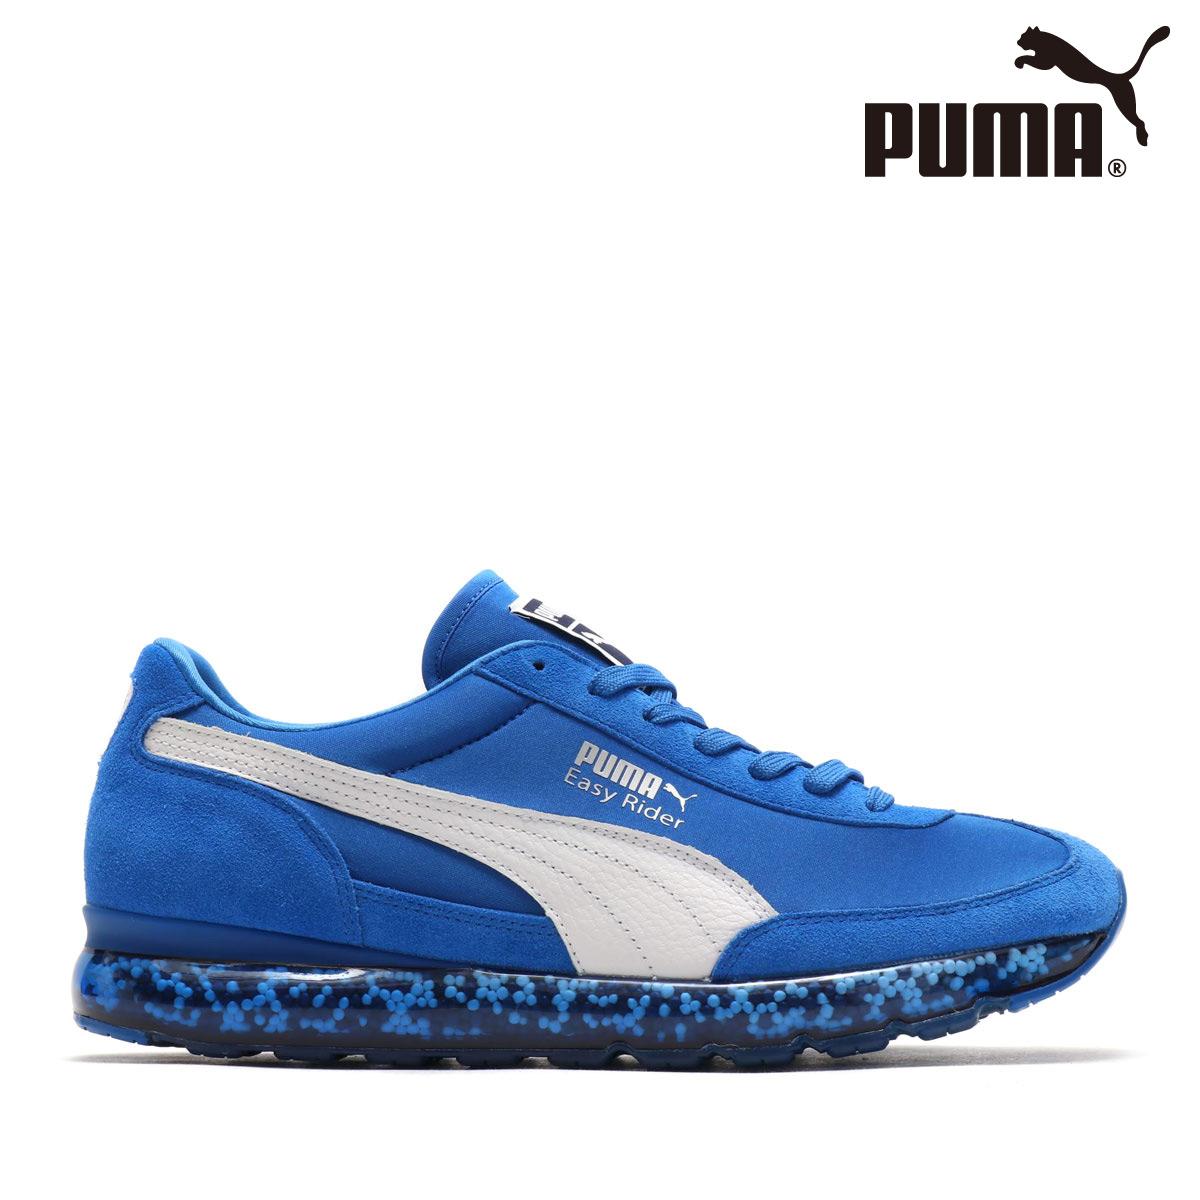 PUMA JAMMING EASY RIDER(STRONG BLUE-P)(プーマ ジャミング イージー ライダー)【メンズサイズ】【スニーカー】【18FW-I】